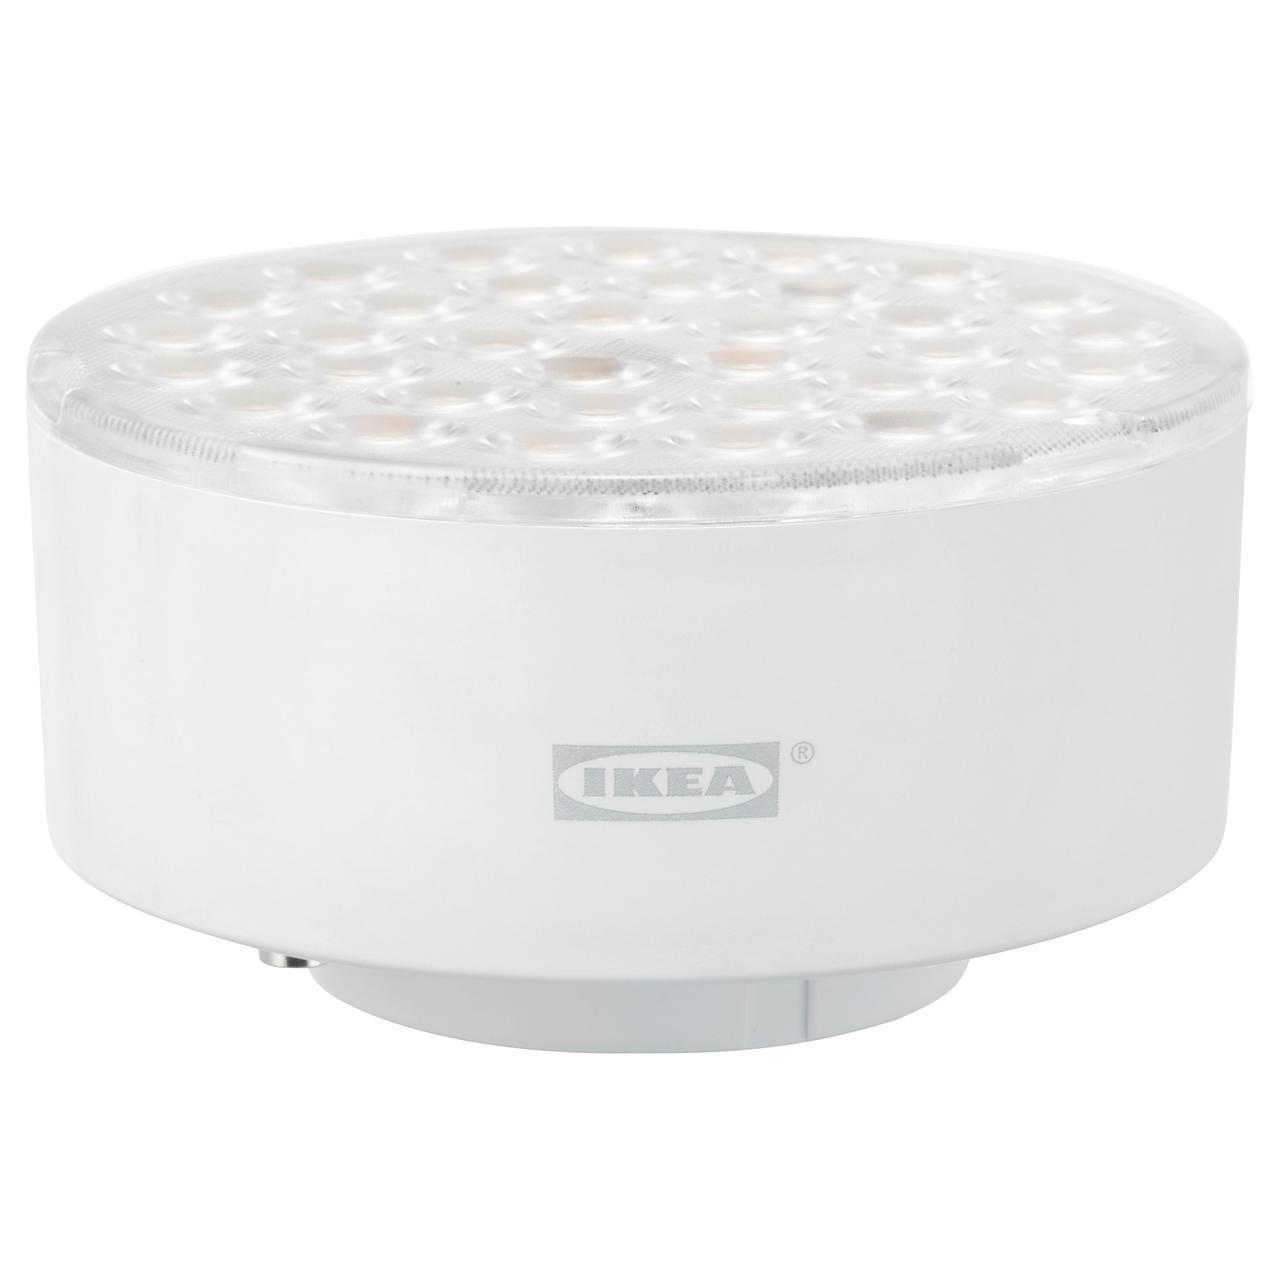 ✅ IKEA LEDARE (003.650.85) Ламповый светодиод GX53 1000 люмен